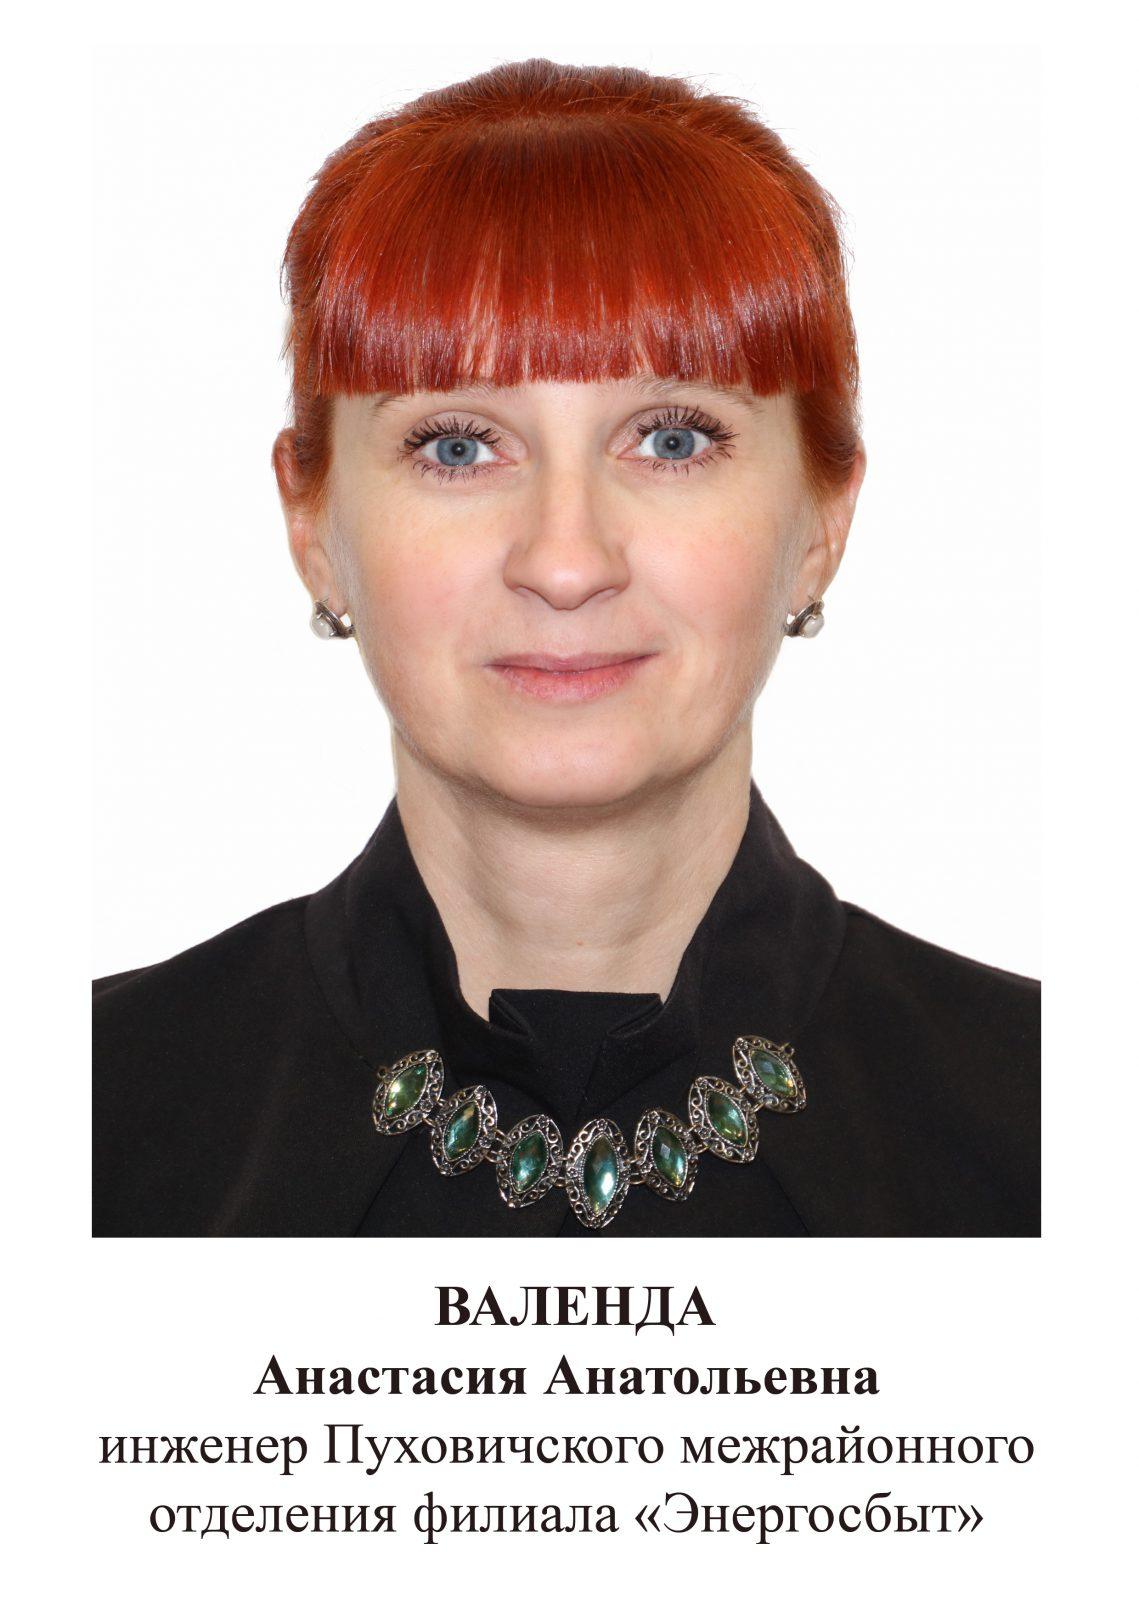 Валенда Анастасия Анатольевна